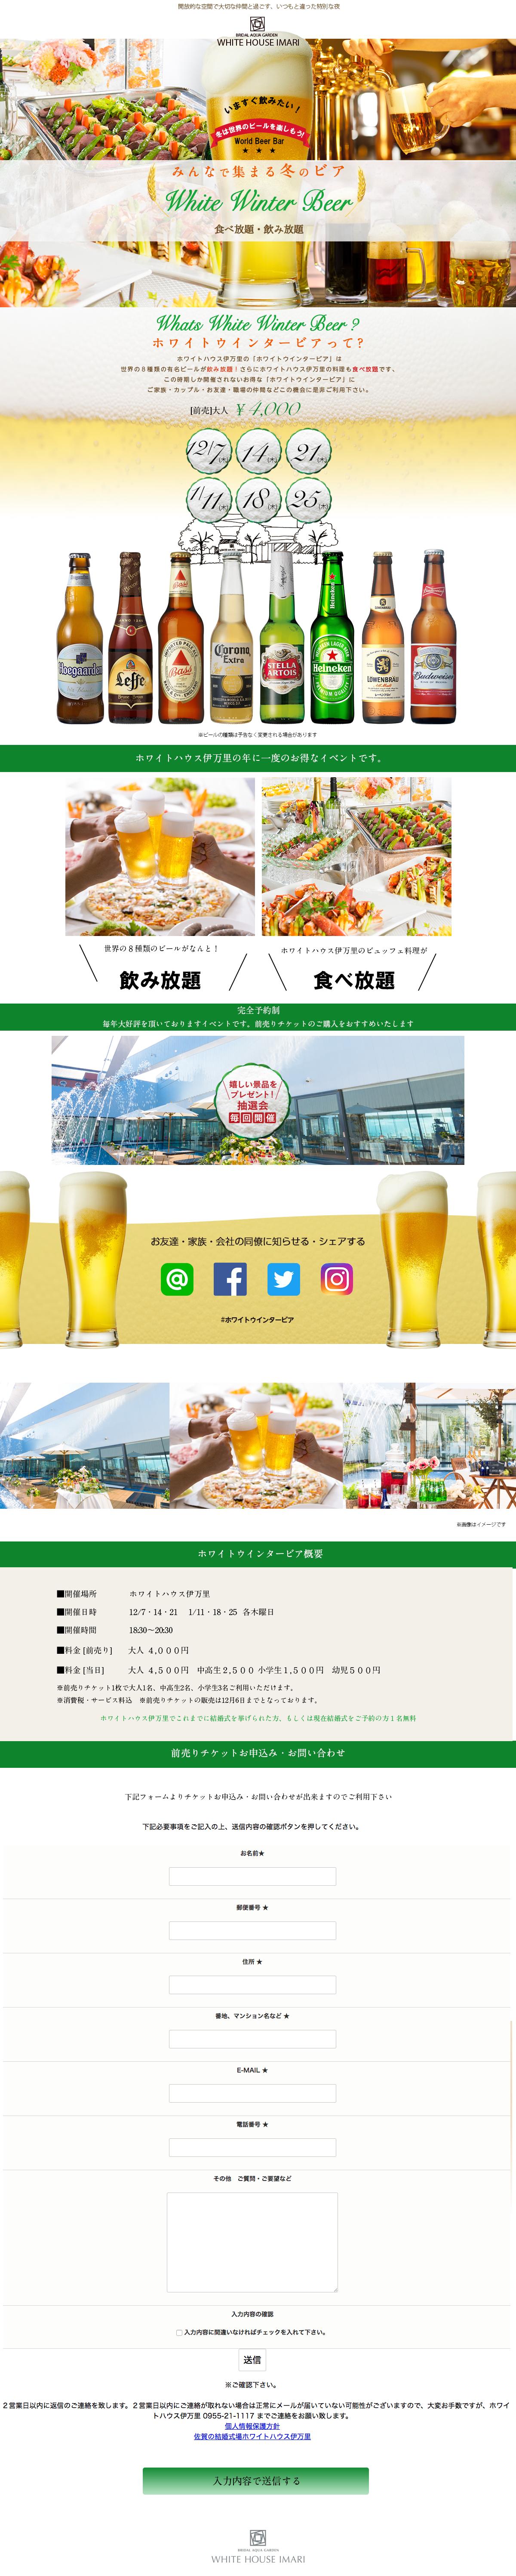 whi_beer